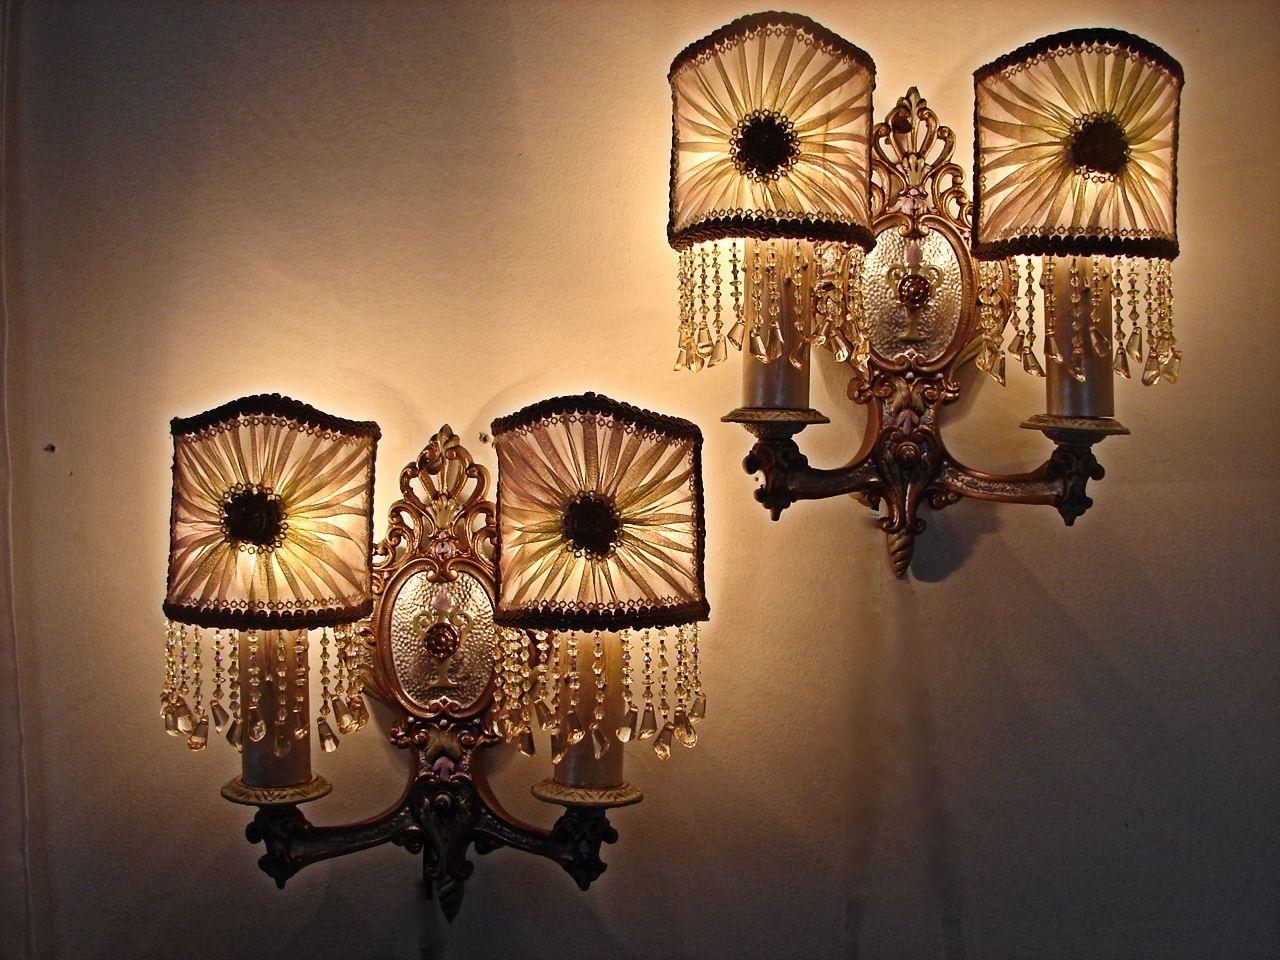 Pin by Ann Johnson on lighting | Vintage wall sconces ... on Decorative Wall Sconces Non Lighting id=45967